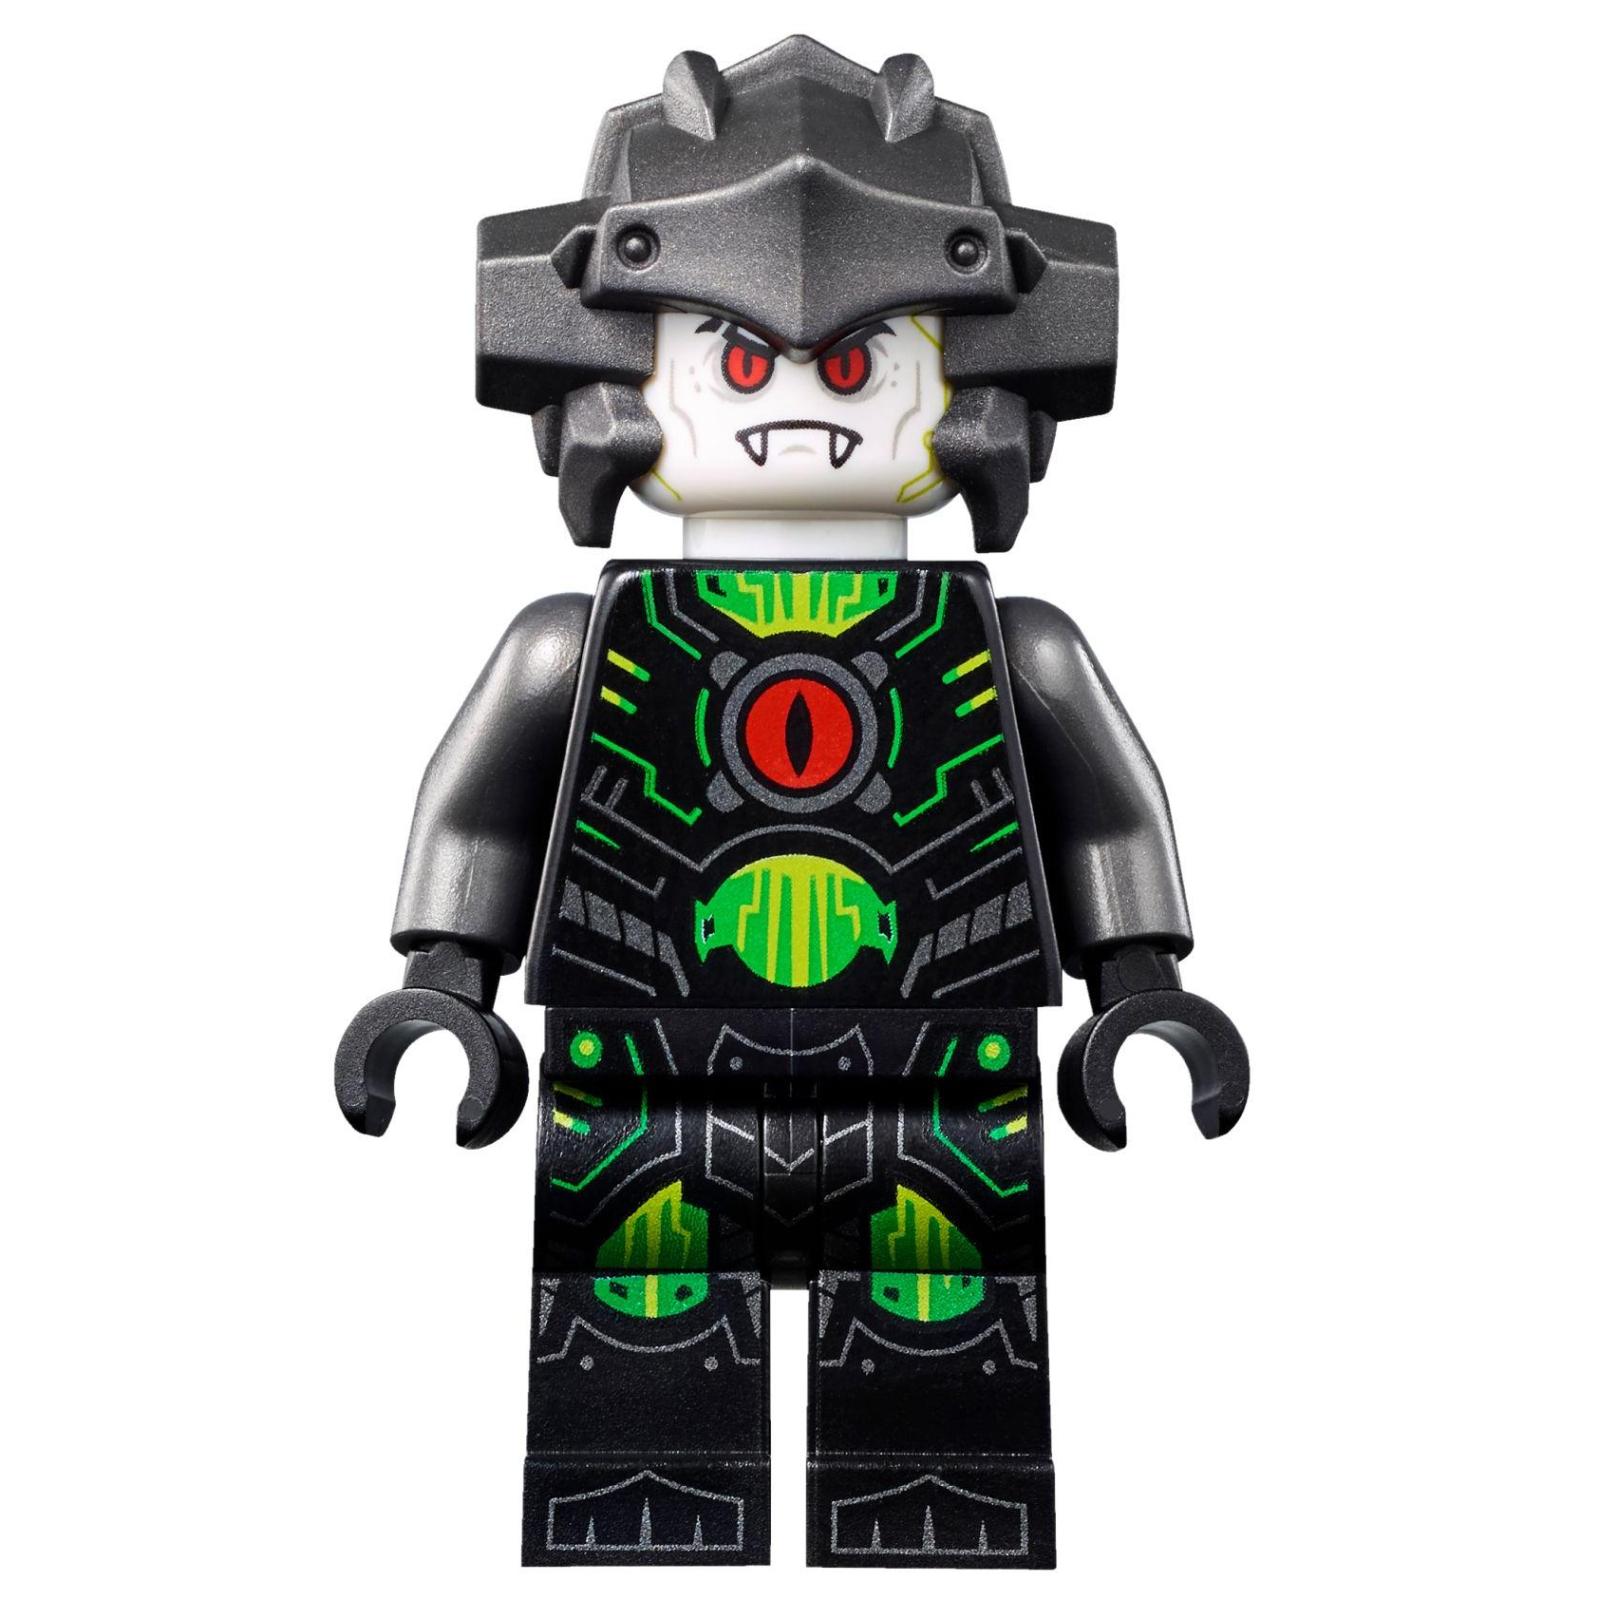 Конструктор LEGO Nexo Knights Бой техномагов (72004) изображение 10